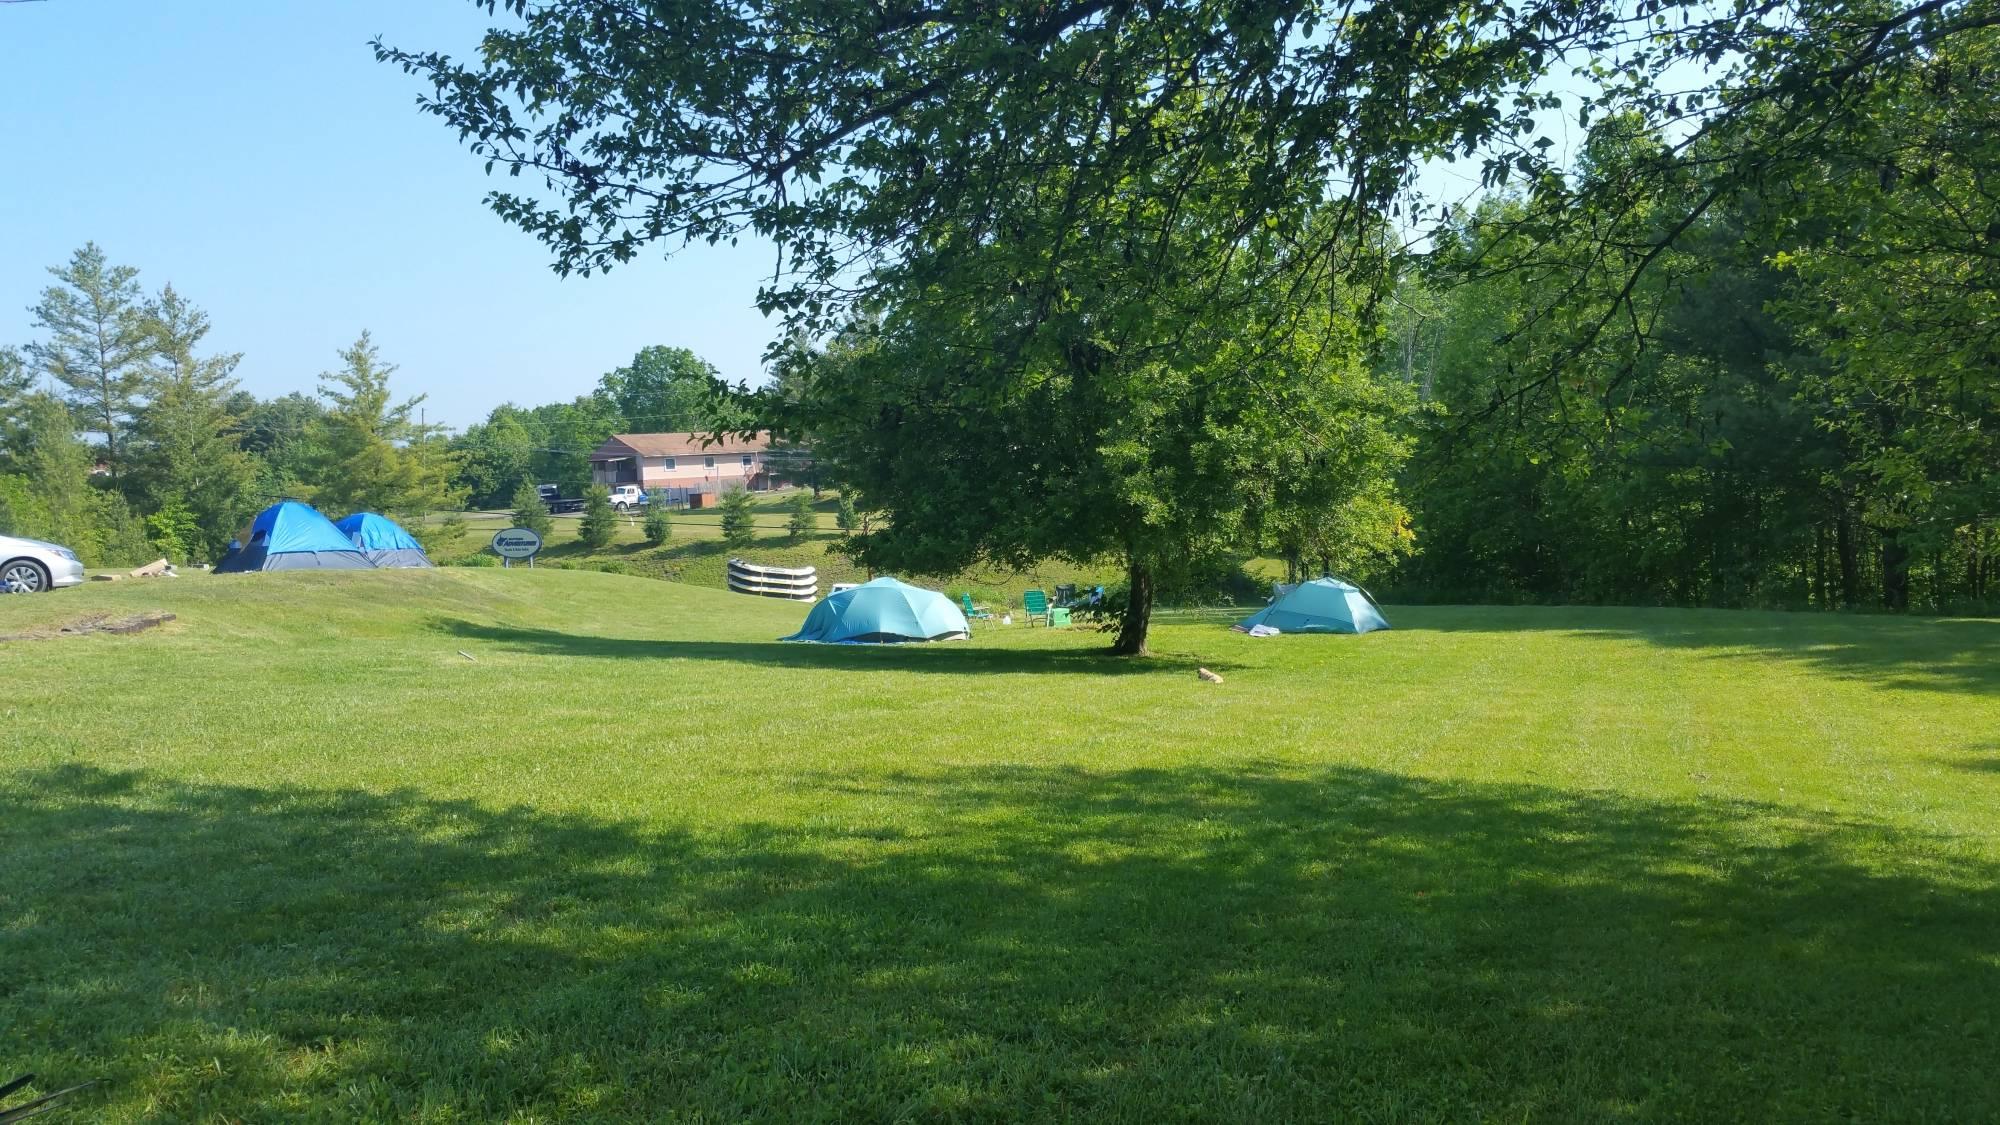 Tent Camping - West Virginia Adventures 800.292.0880